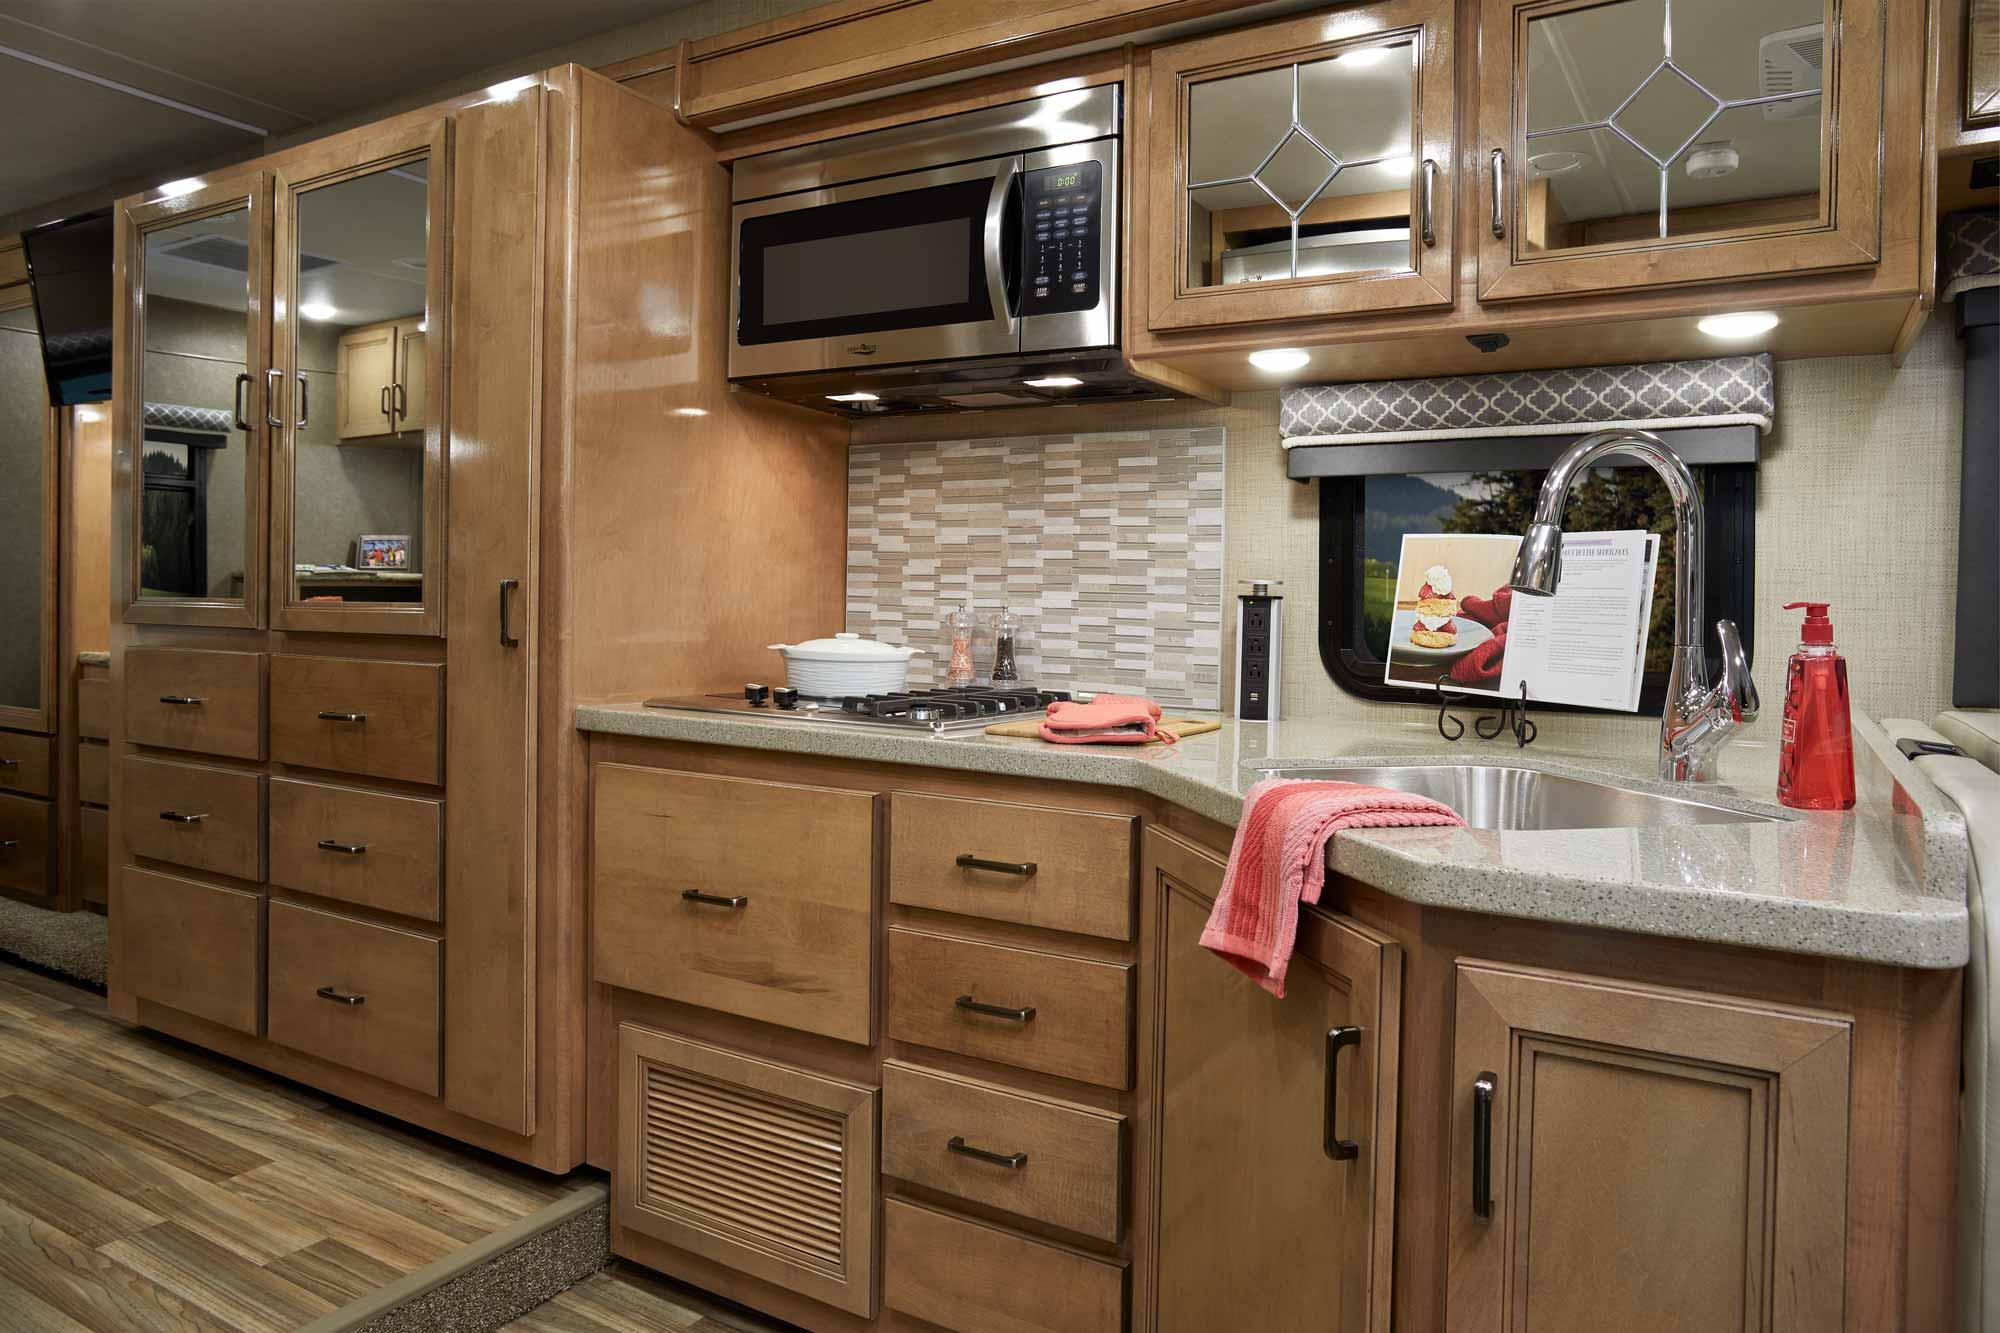 Quantum Class C Motorhomes Thor Motor Coach Axis F350 Fuse Box Diagram 2019 Ws31 Cloud Nine Prestige Maple Kitchen